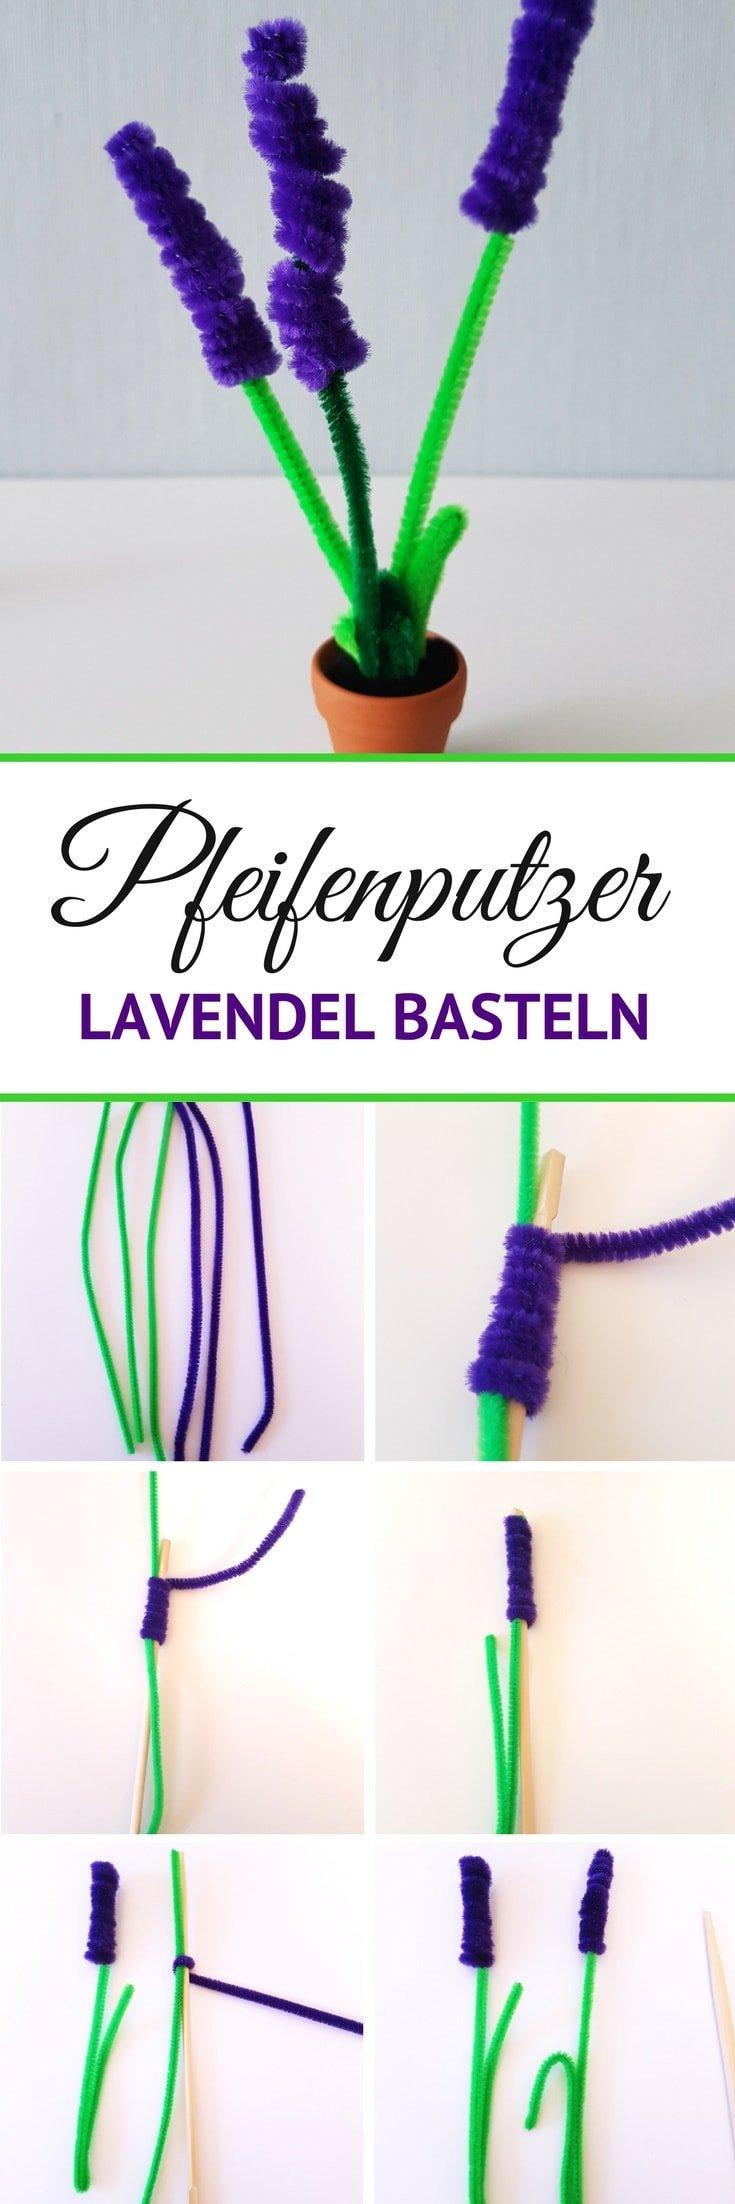 DIY Anleitung Pfeifenputzer Lavendel Blumen basteln